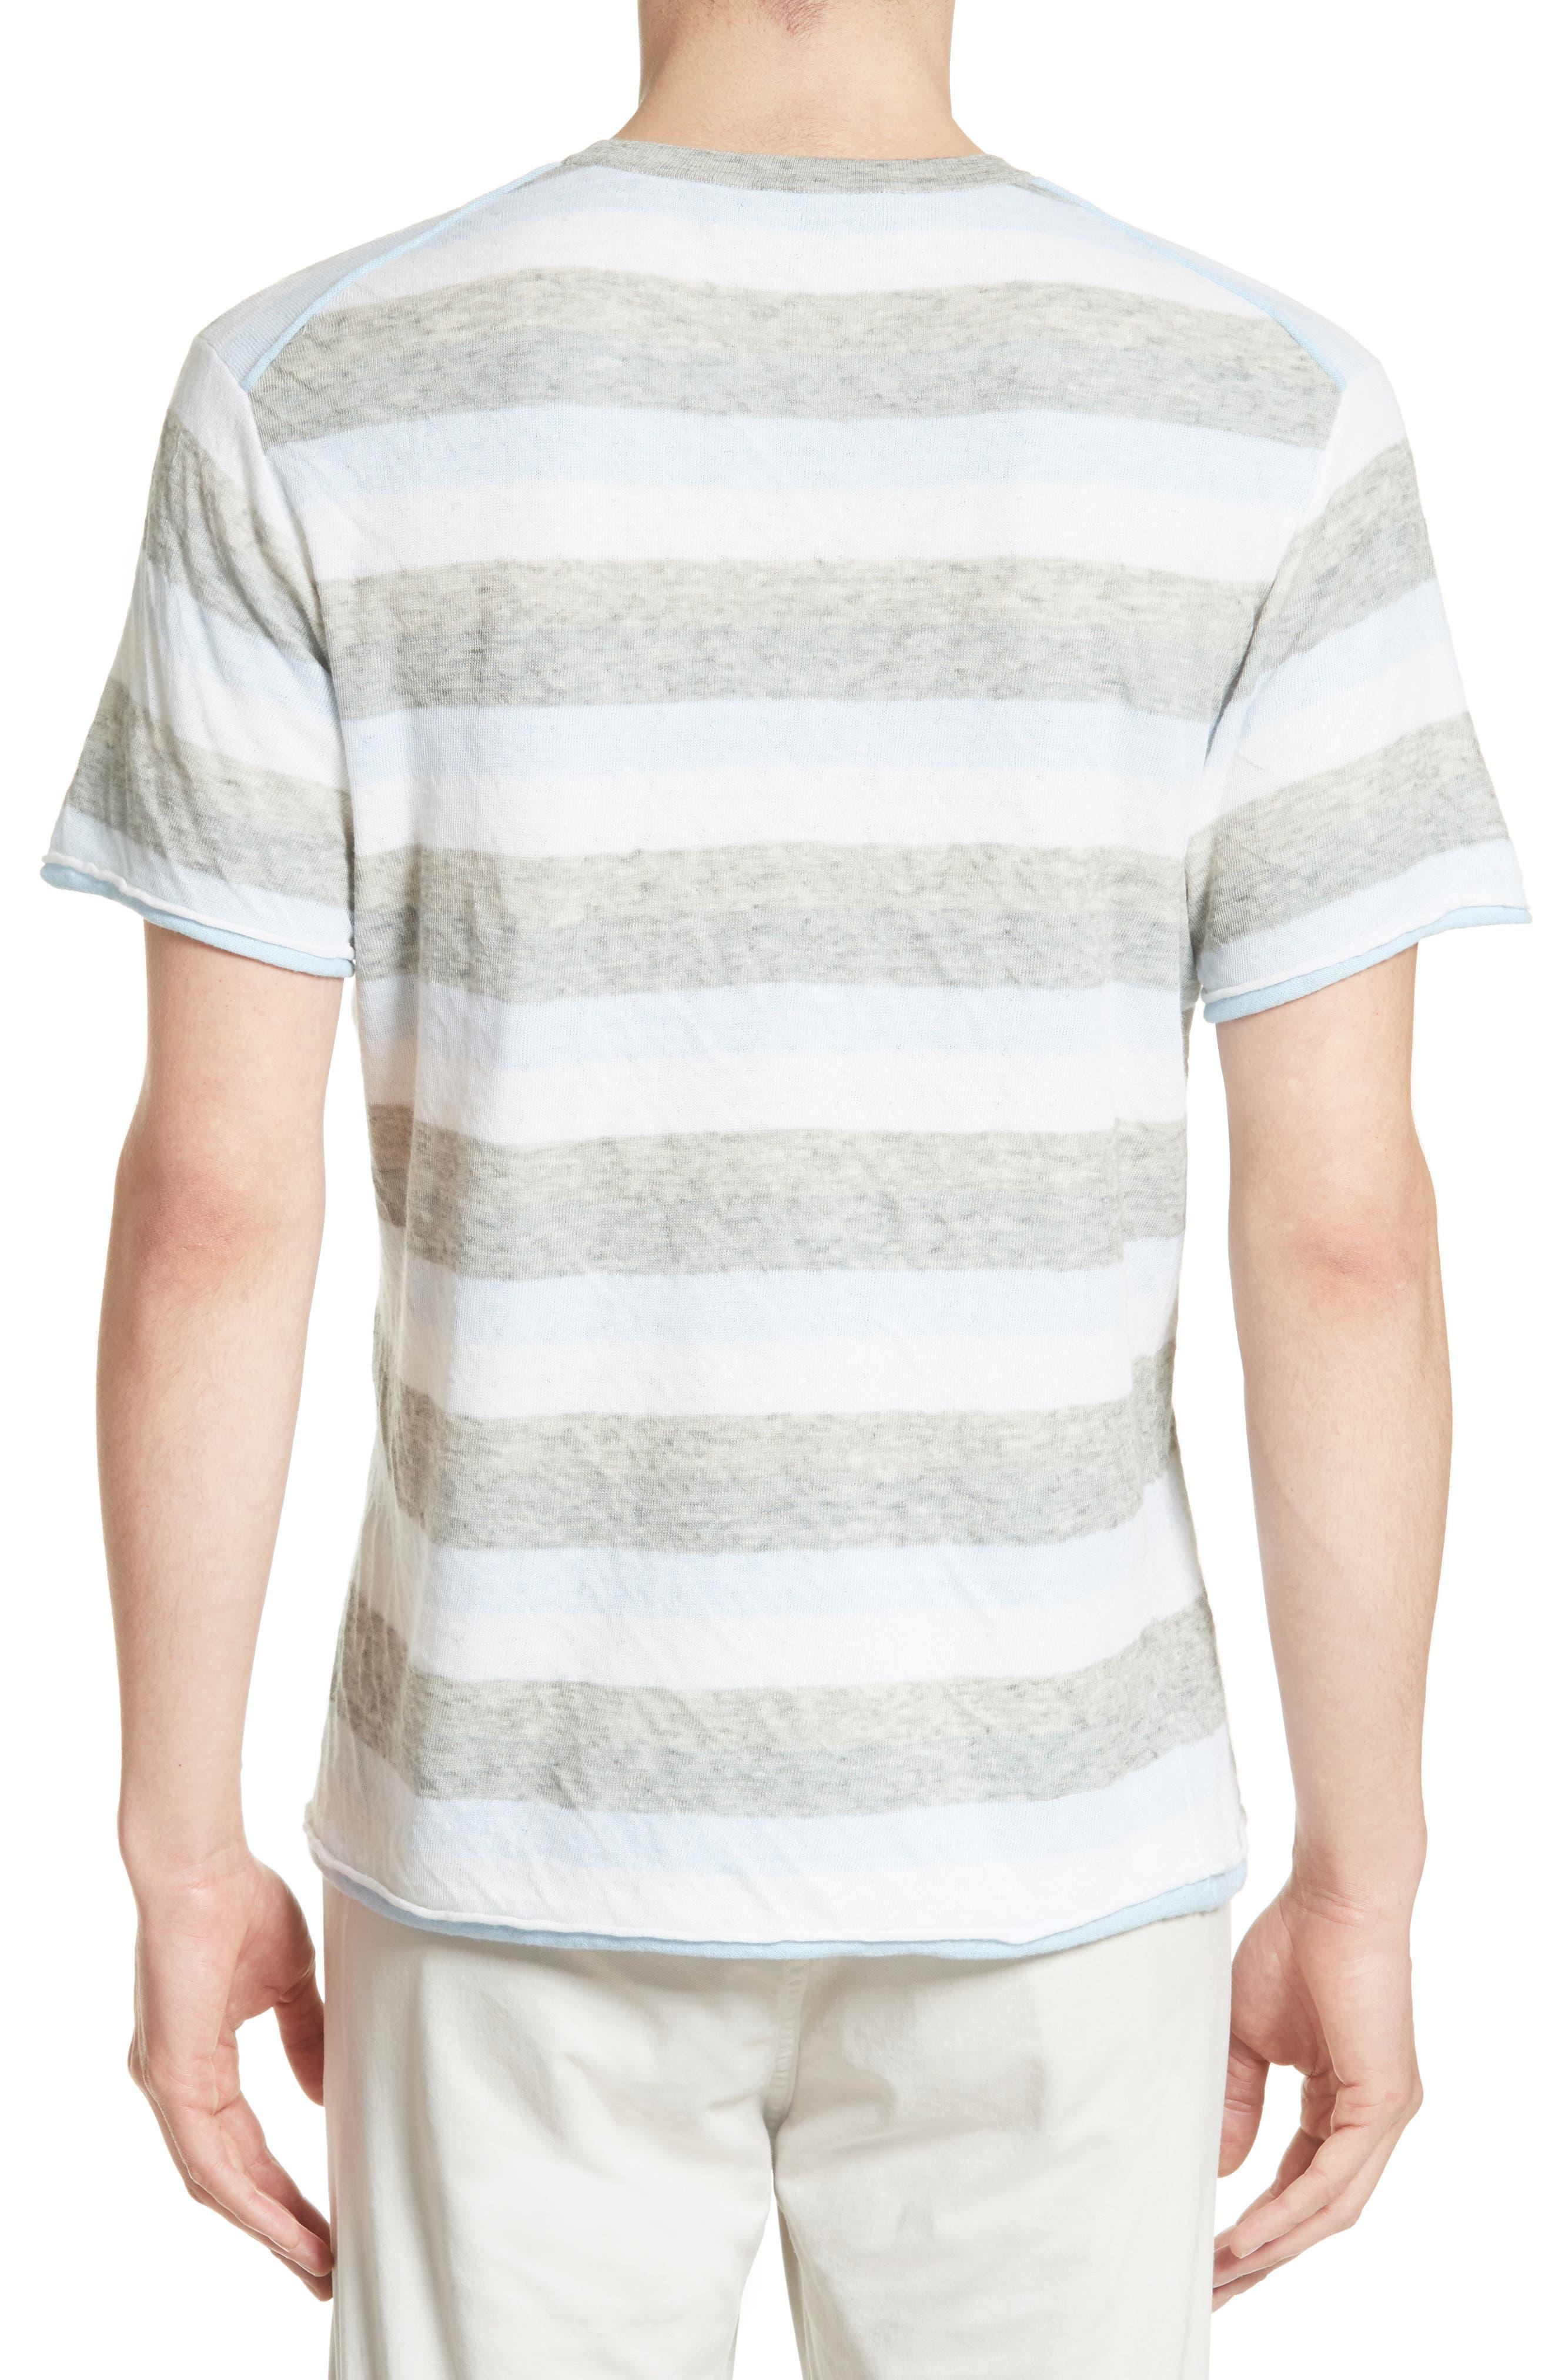 Tripp Cotton & Wool T-Shirt,                             Alternate thumbnail 2, color,                             461